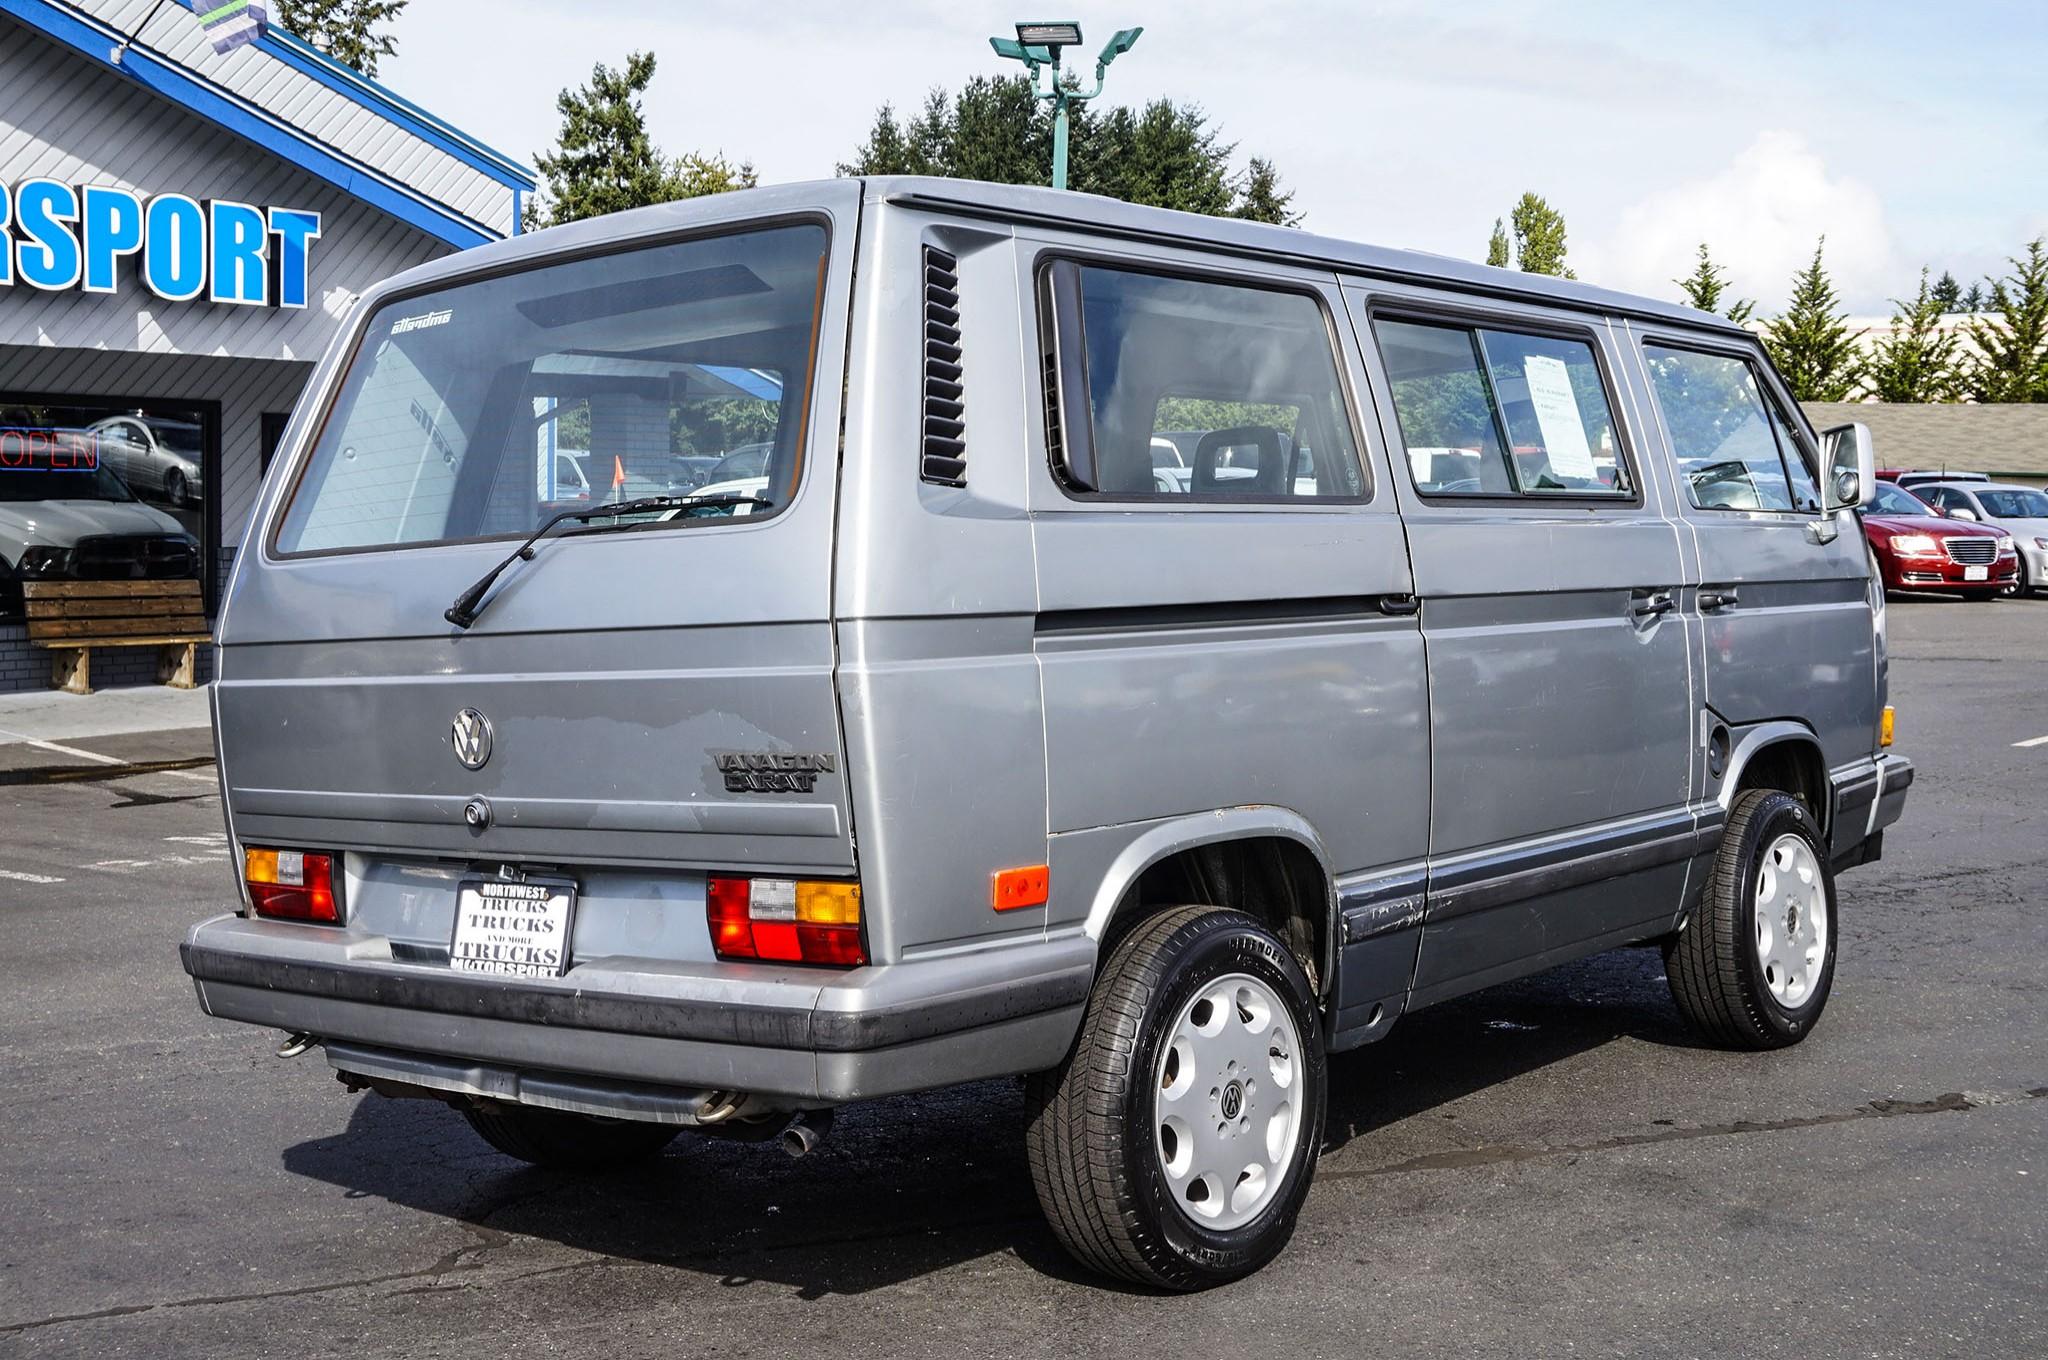 used 1989 volkswagen routan awd minivan van for sale 31878a. Black Bedroom Furniture Sets. Home Design Ideas